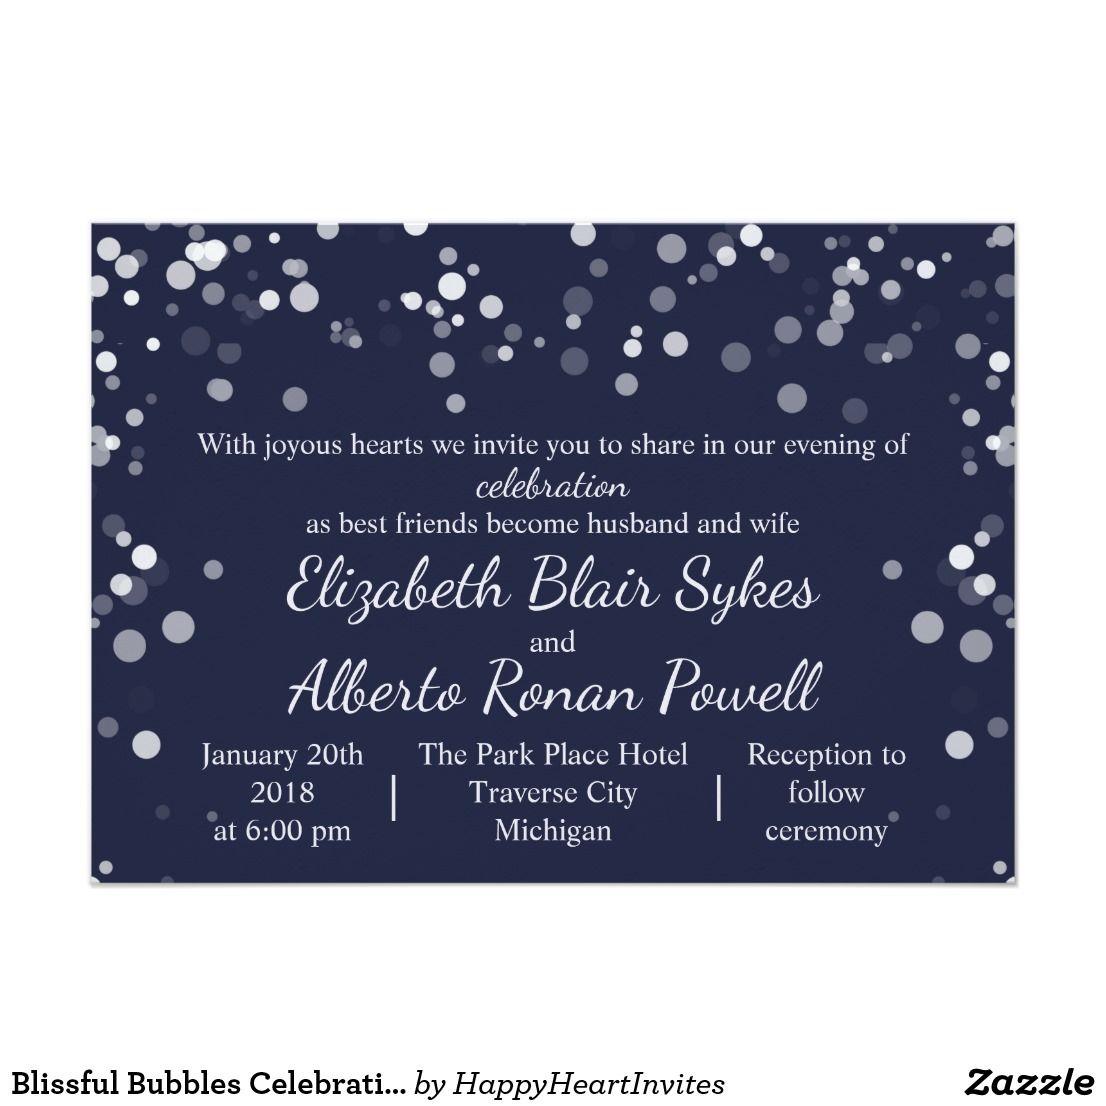 Blissful Bubbles Celebration Wedding Invitation